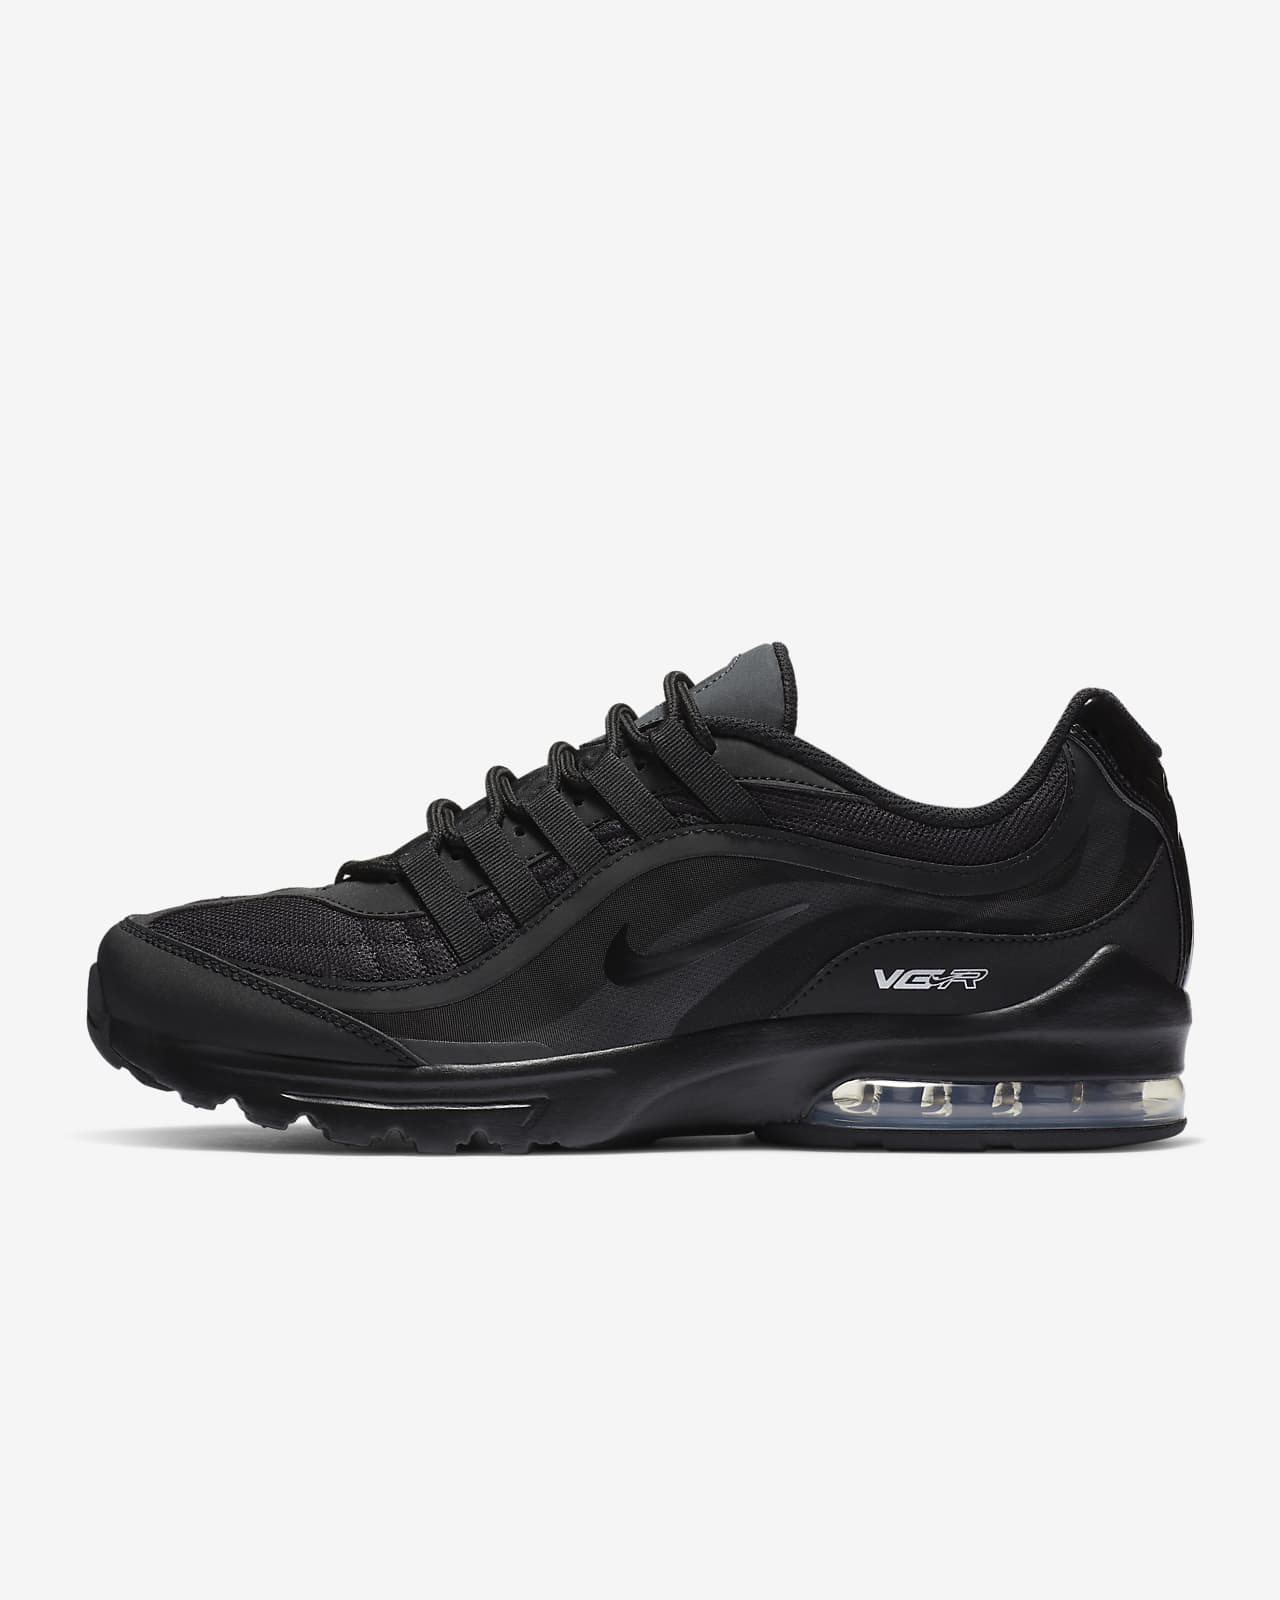 Мужские кроссовки Nike Air Max VG-R